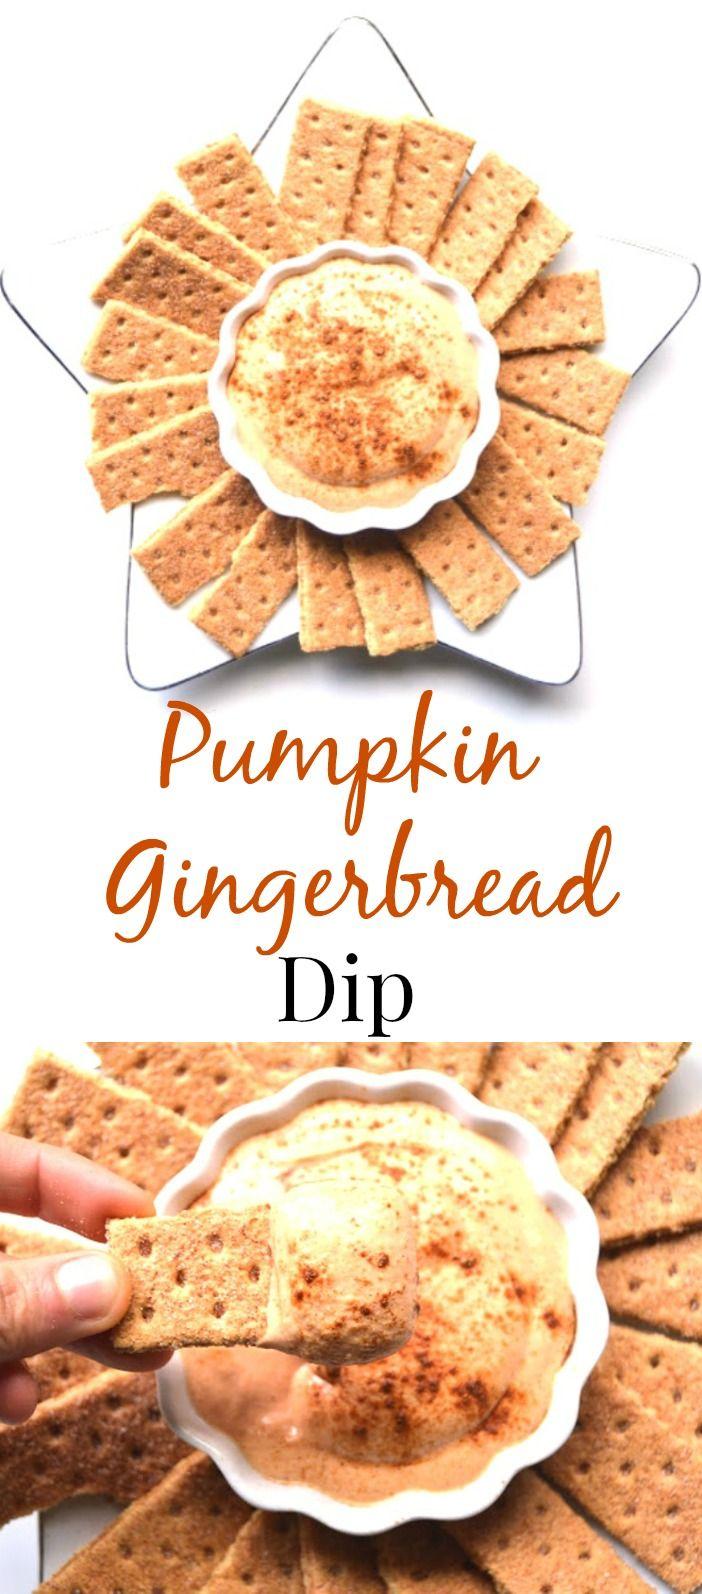 Pumpkin Gingerbread Dip Pumpkin gingerbread, Healthy